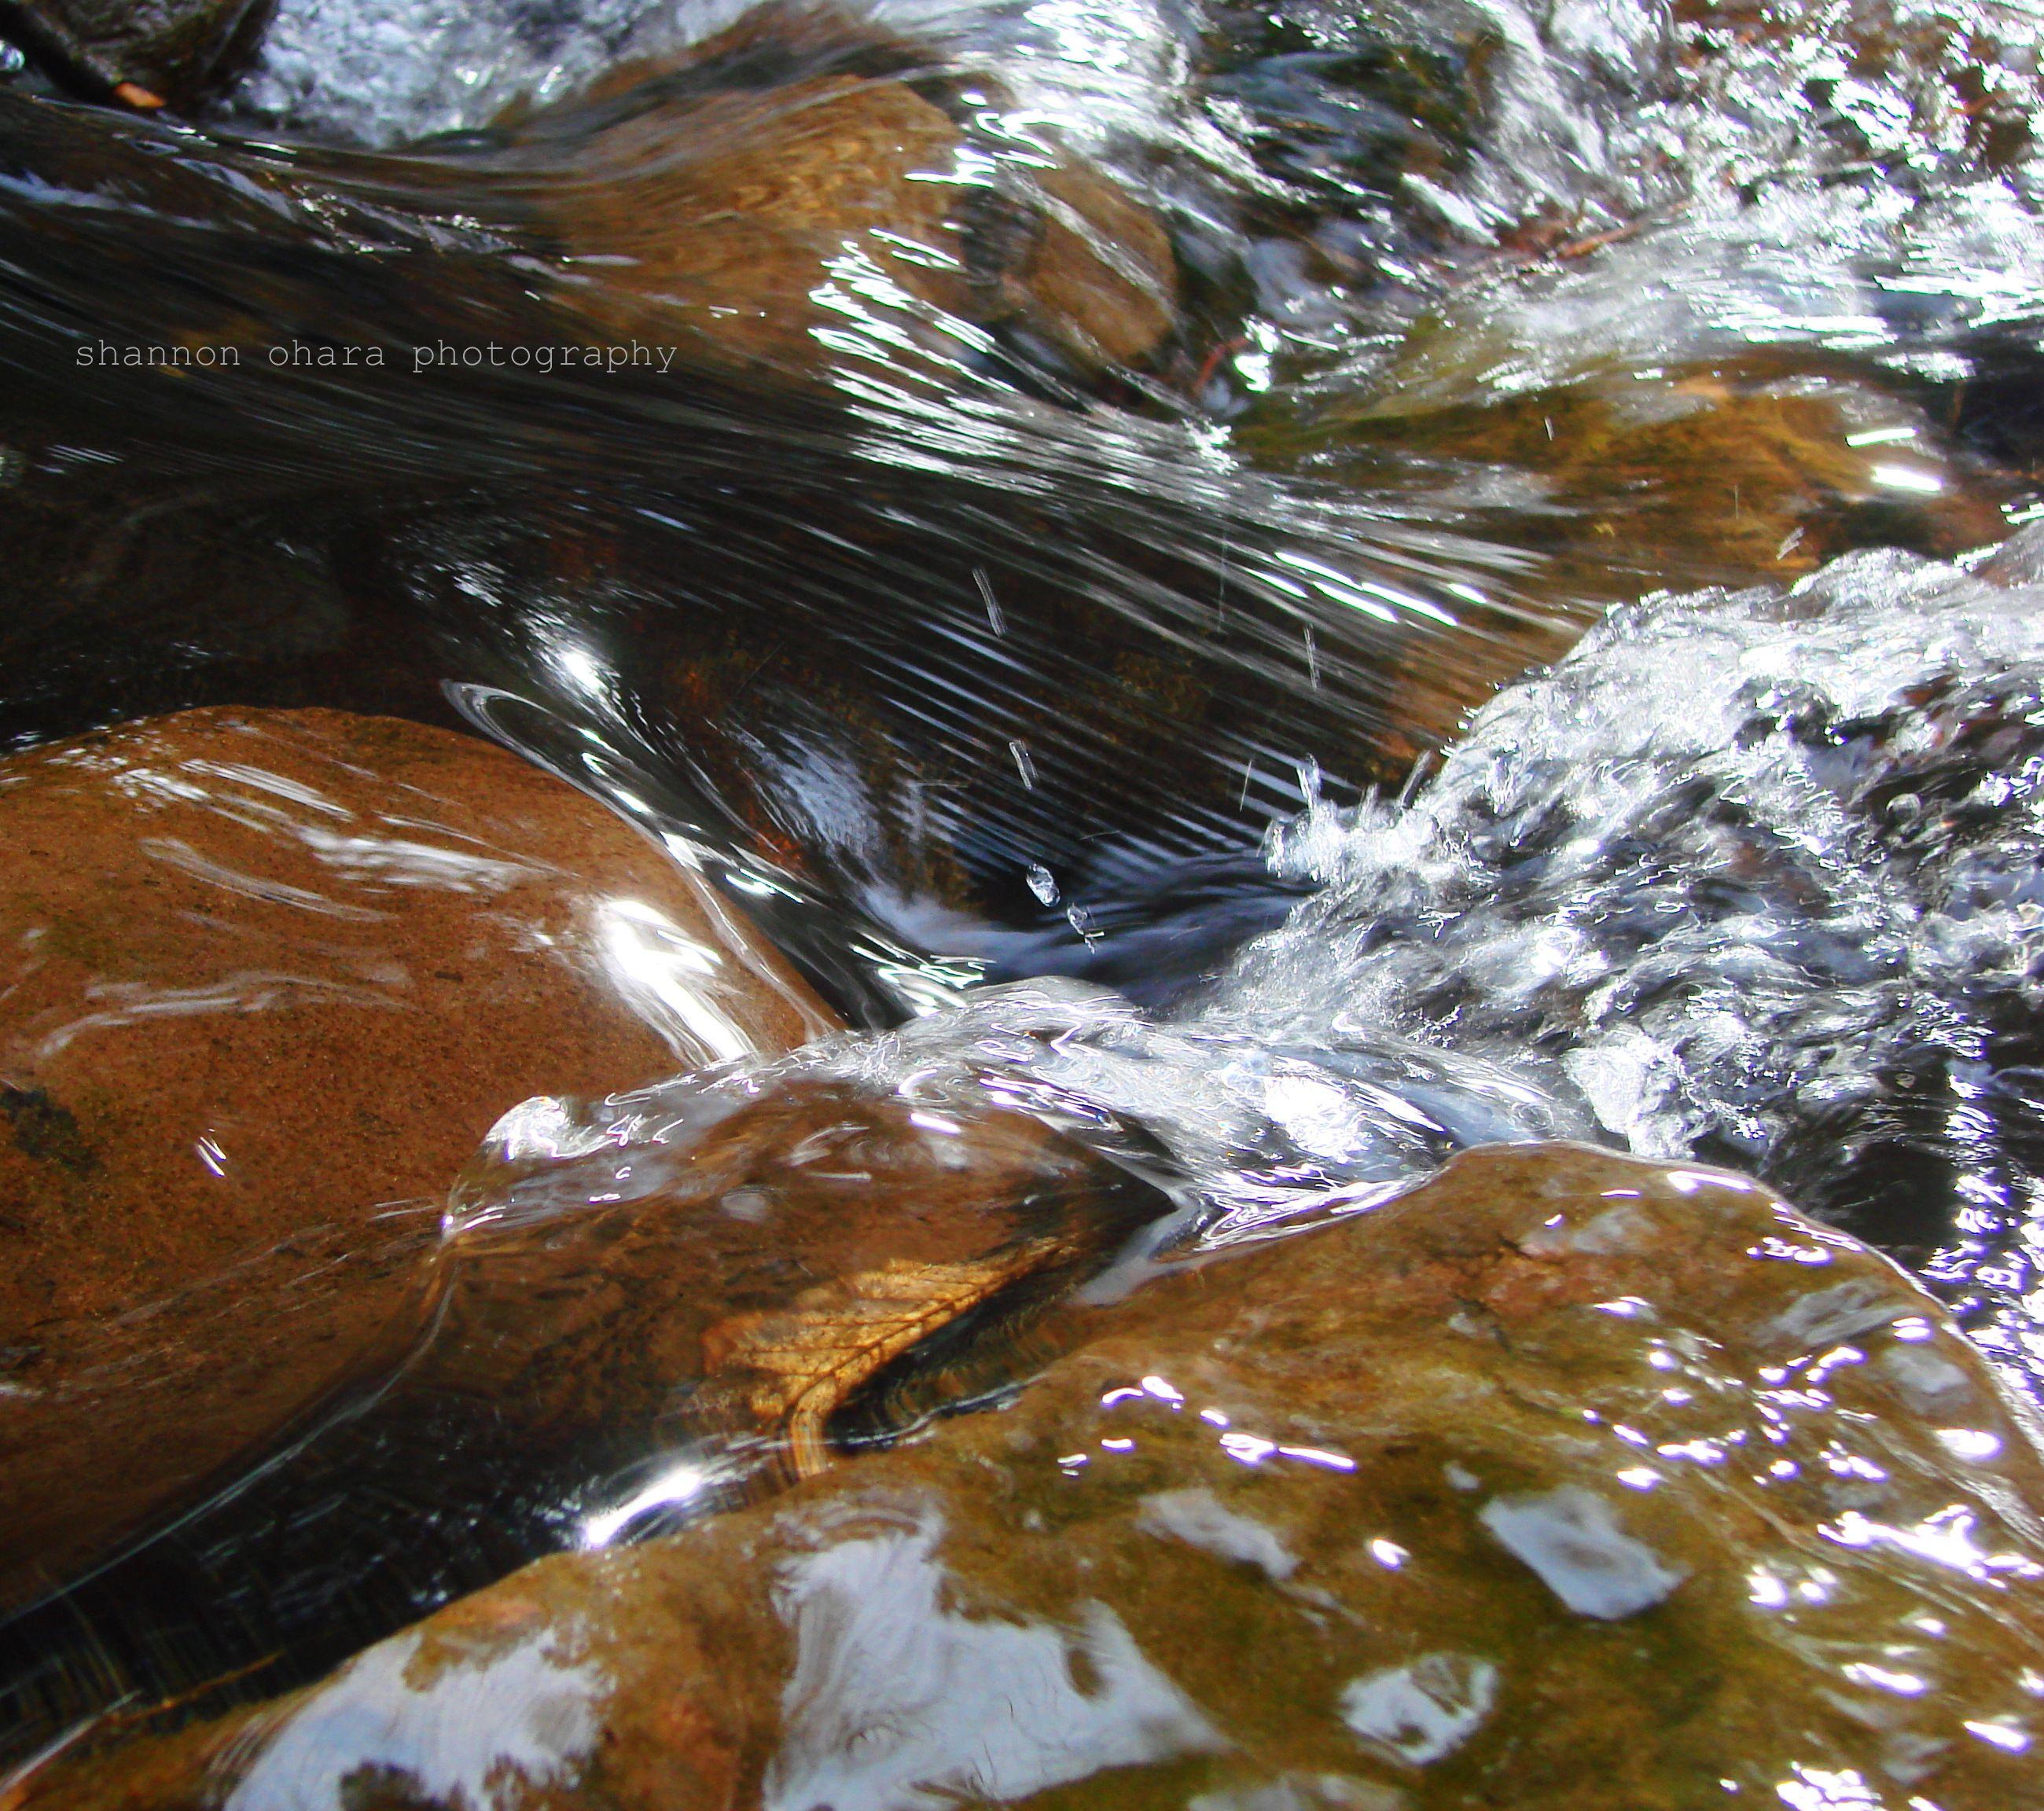 Wondrous Waters Shannon O'Hara Photography